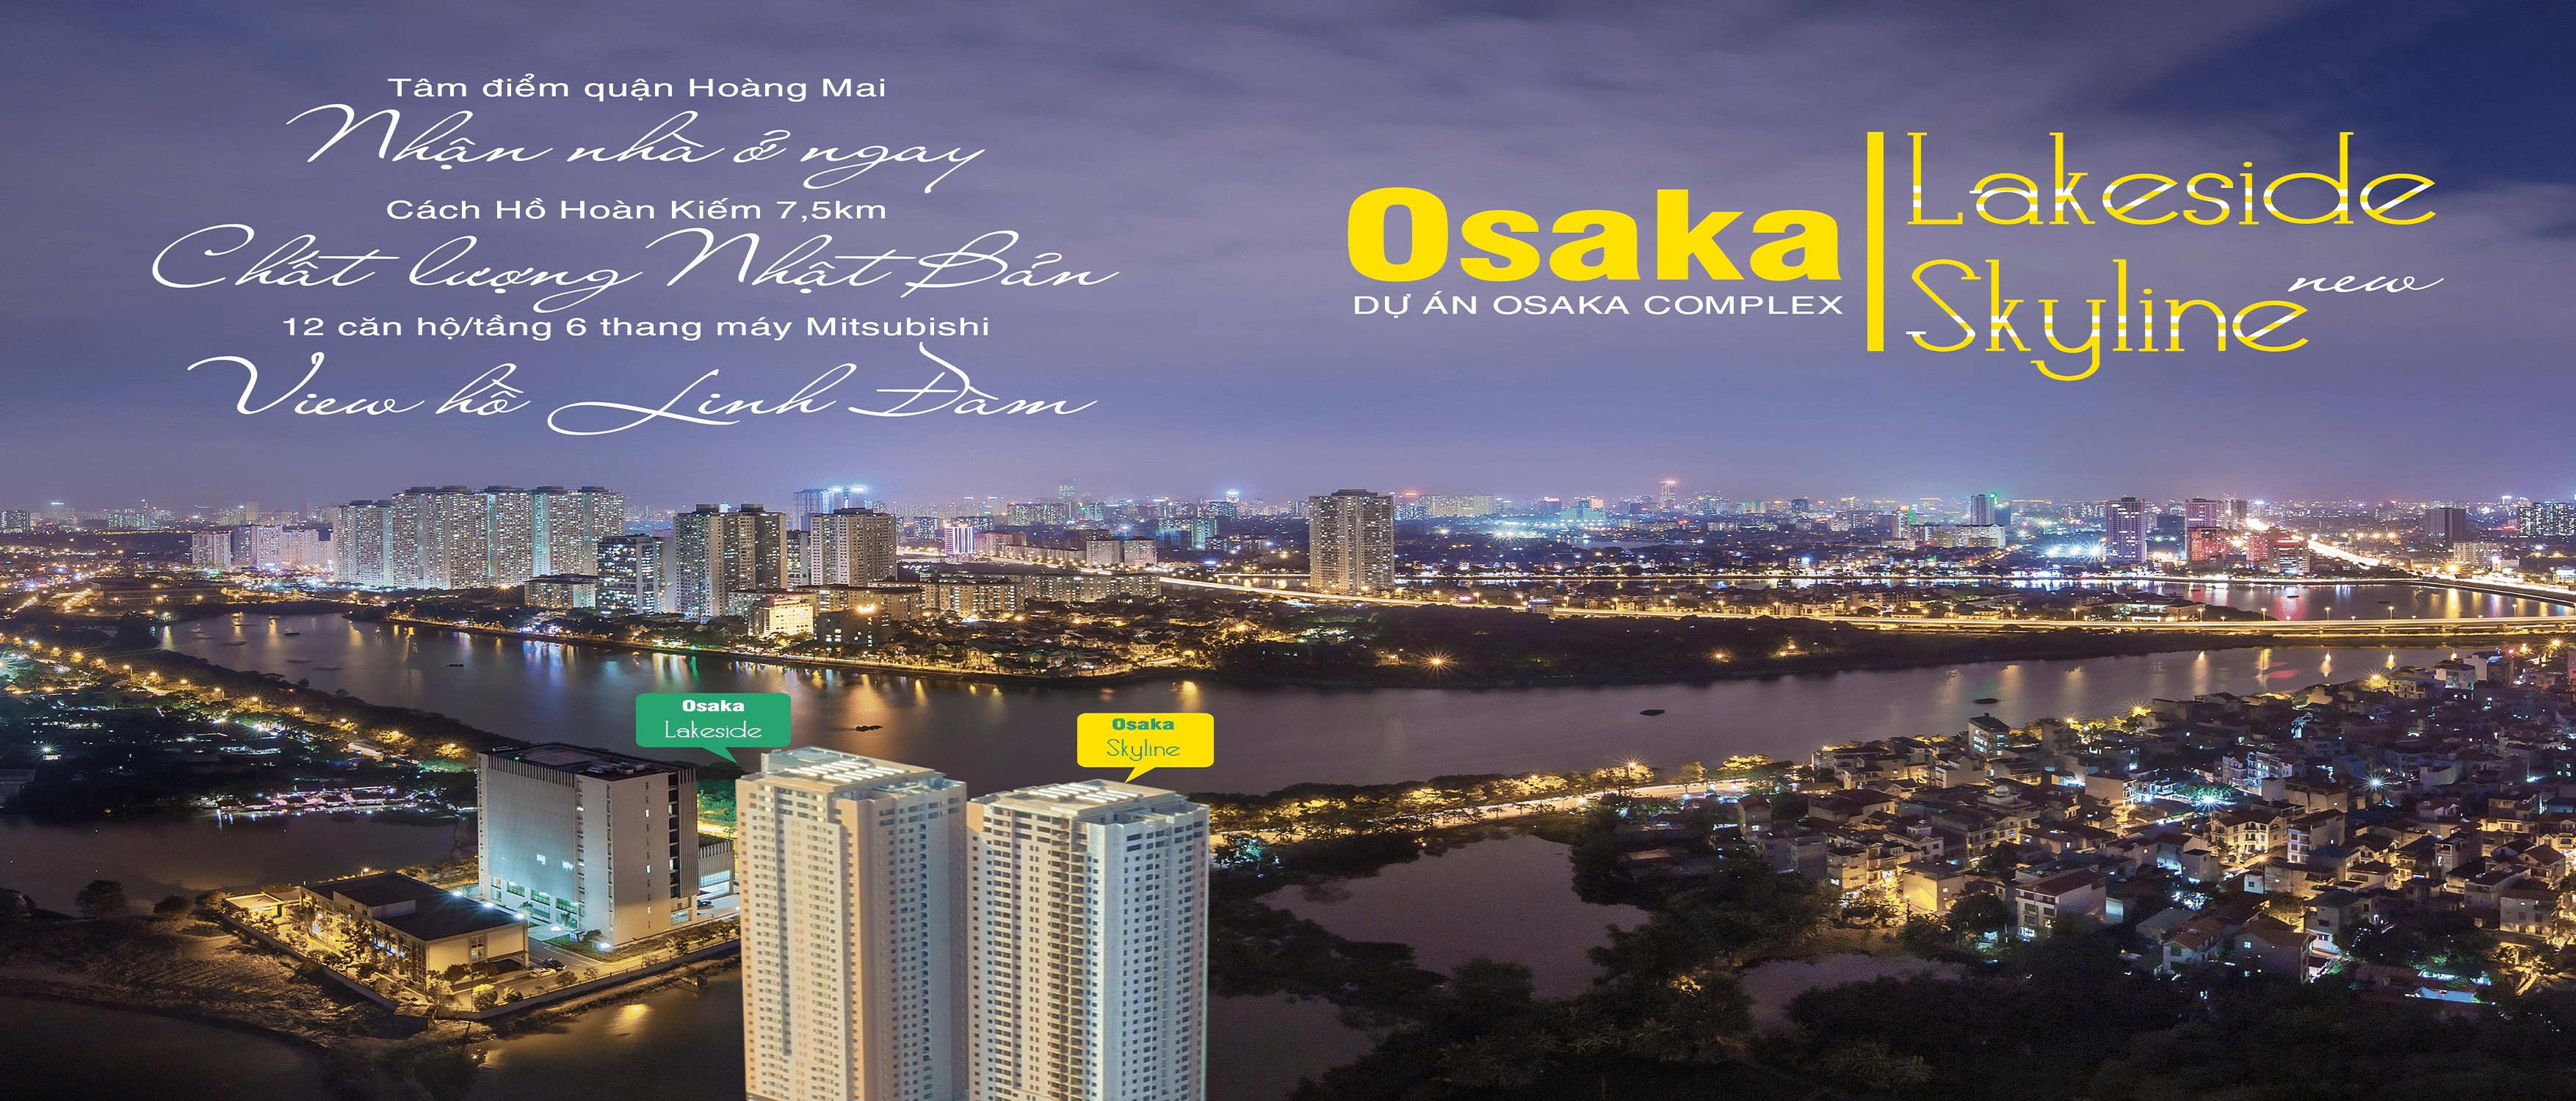 Chung cư Osaka Complex 48 Ngọc Hồi mở bán Tòa Osaka Skyline Complex